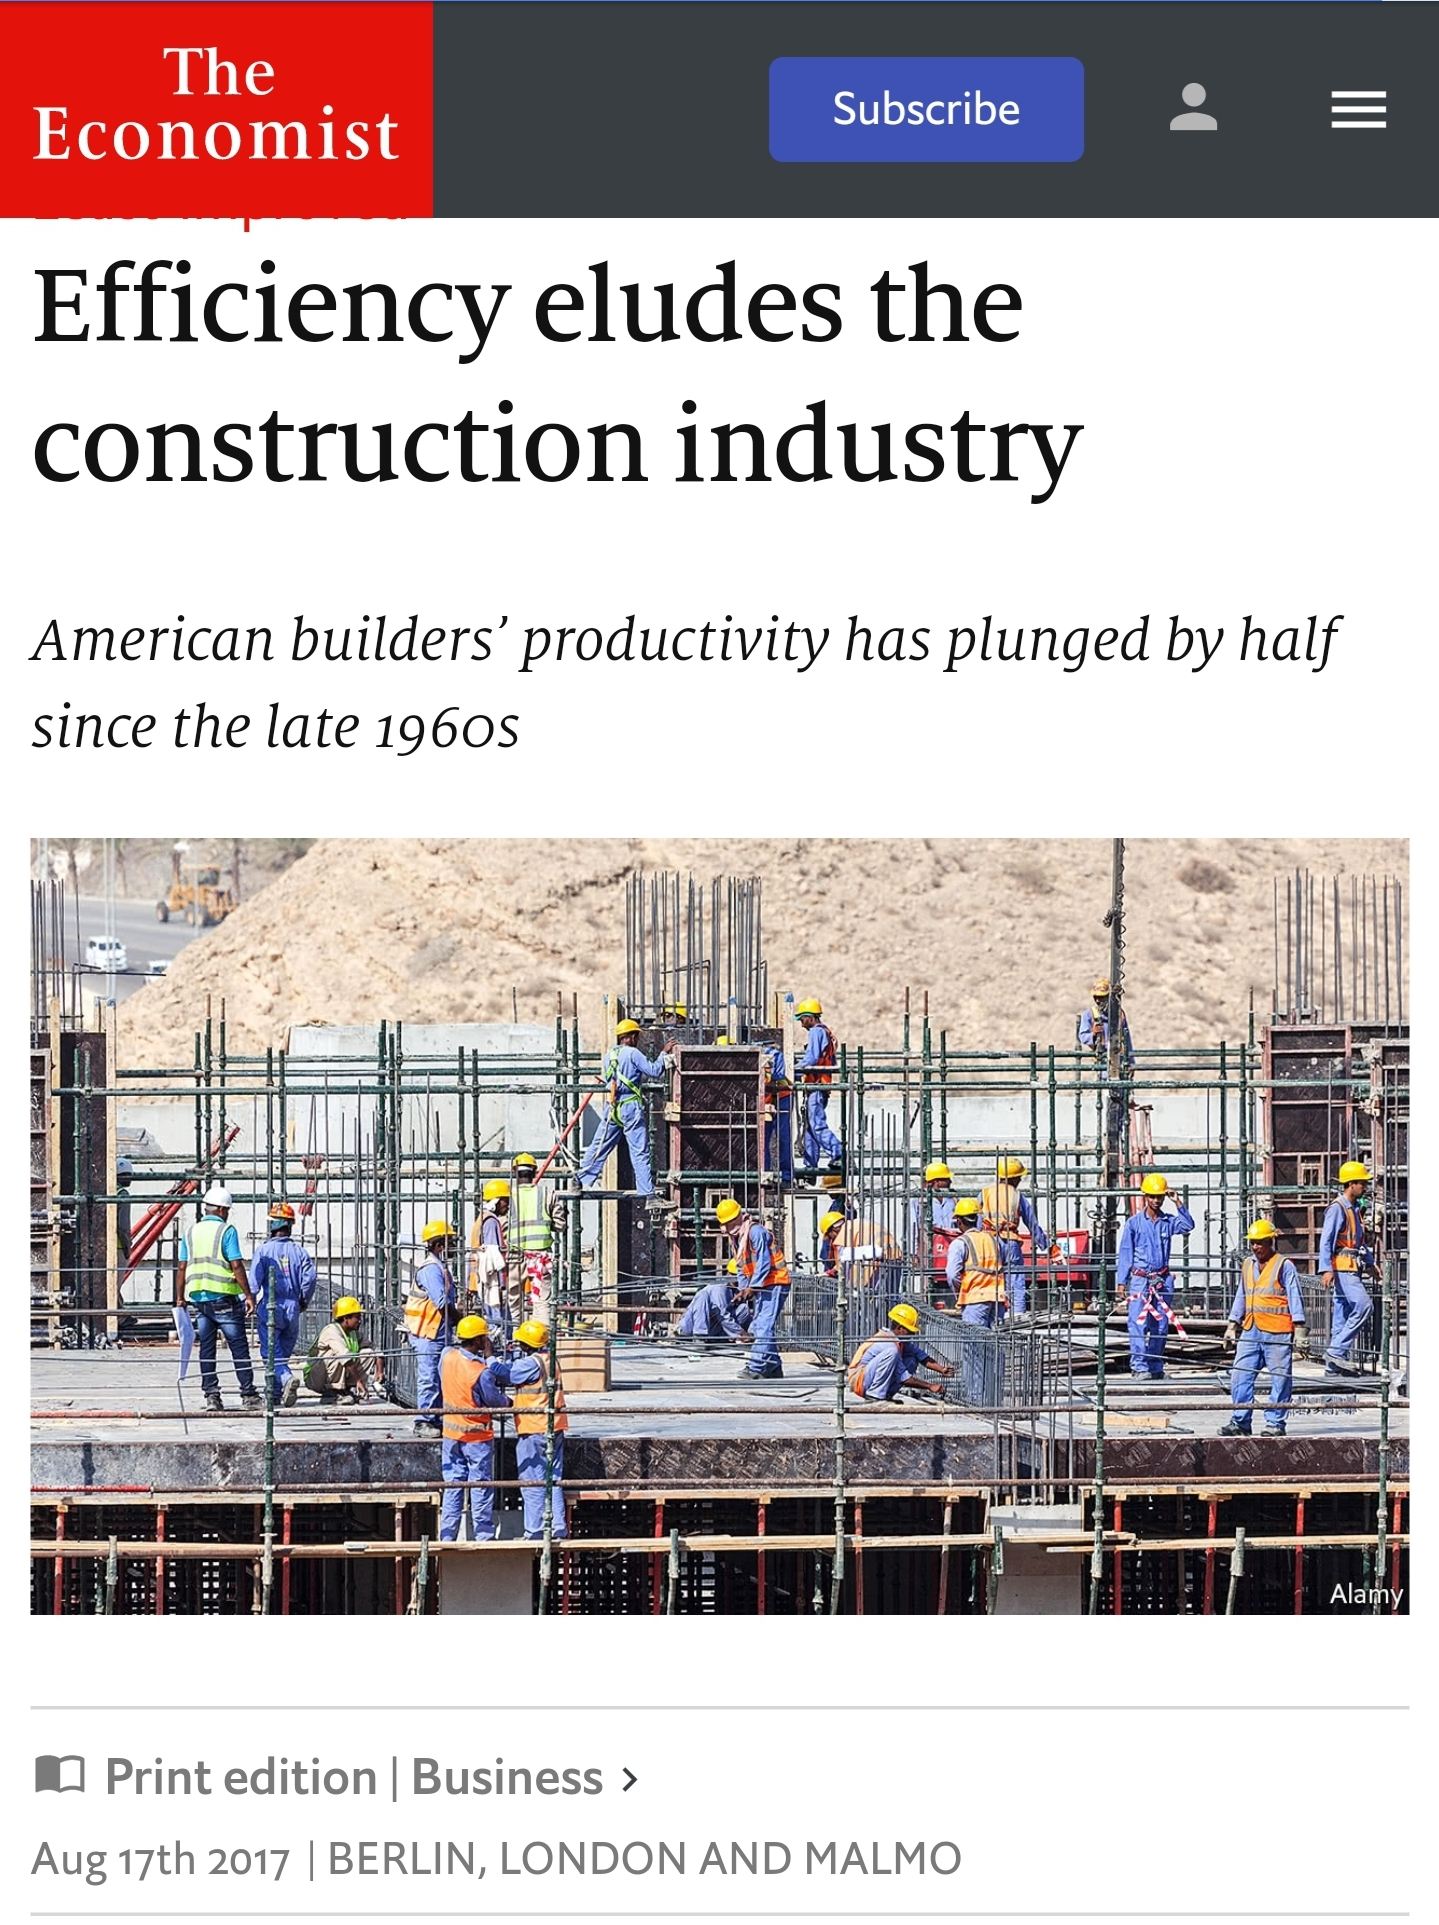 The Economist efficiency article